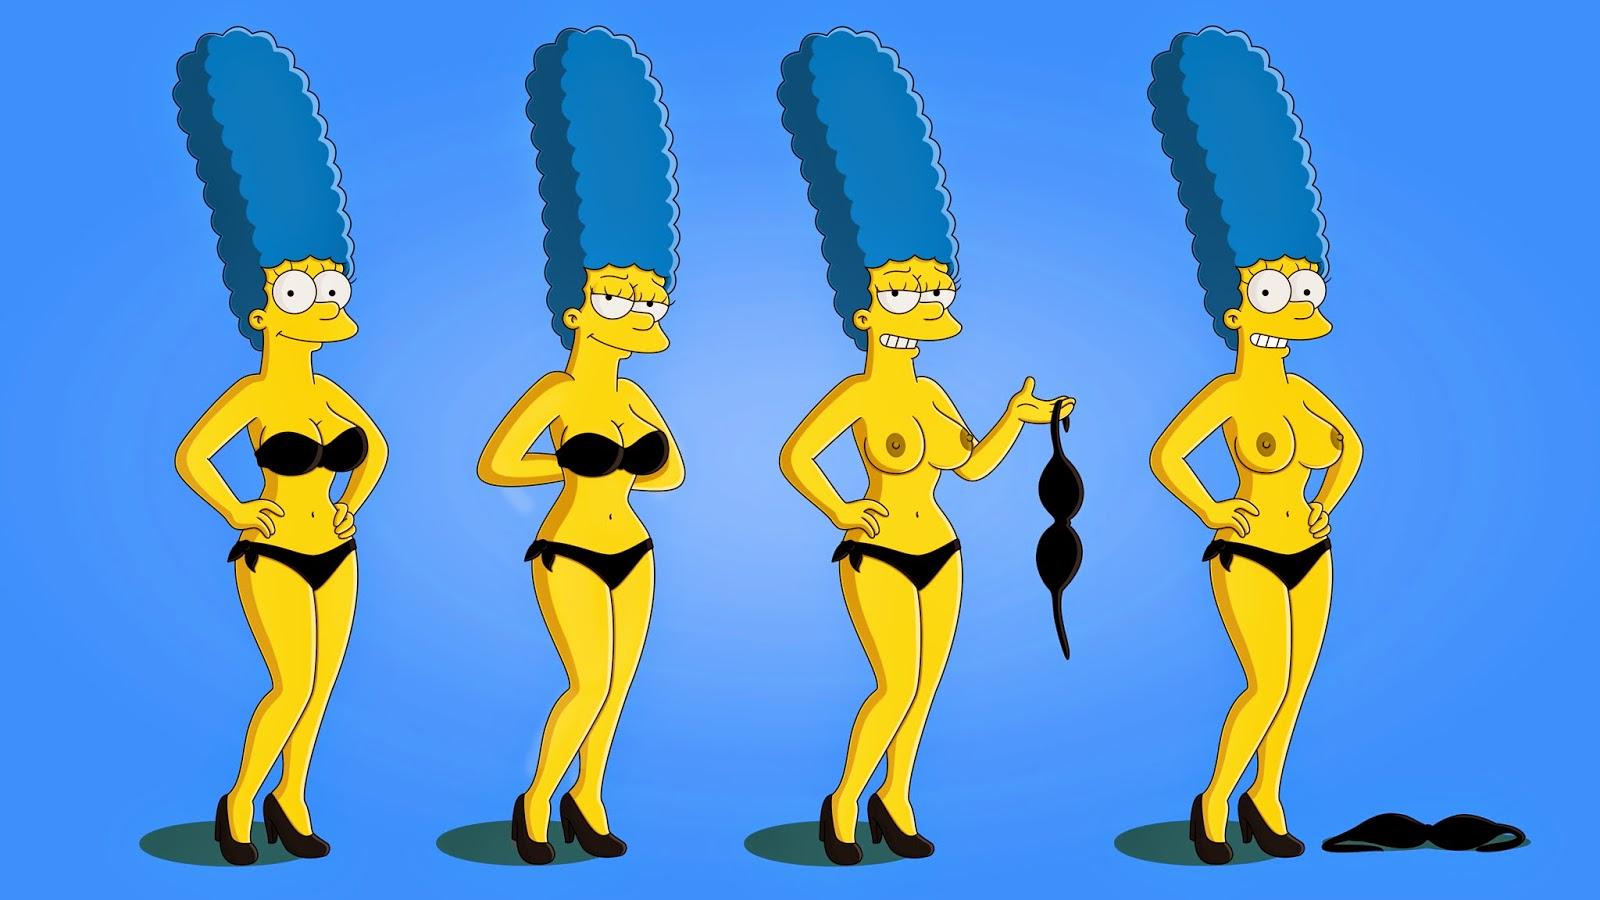 Симпсоны порно фото онлайн 9 фотография